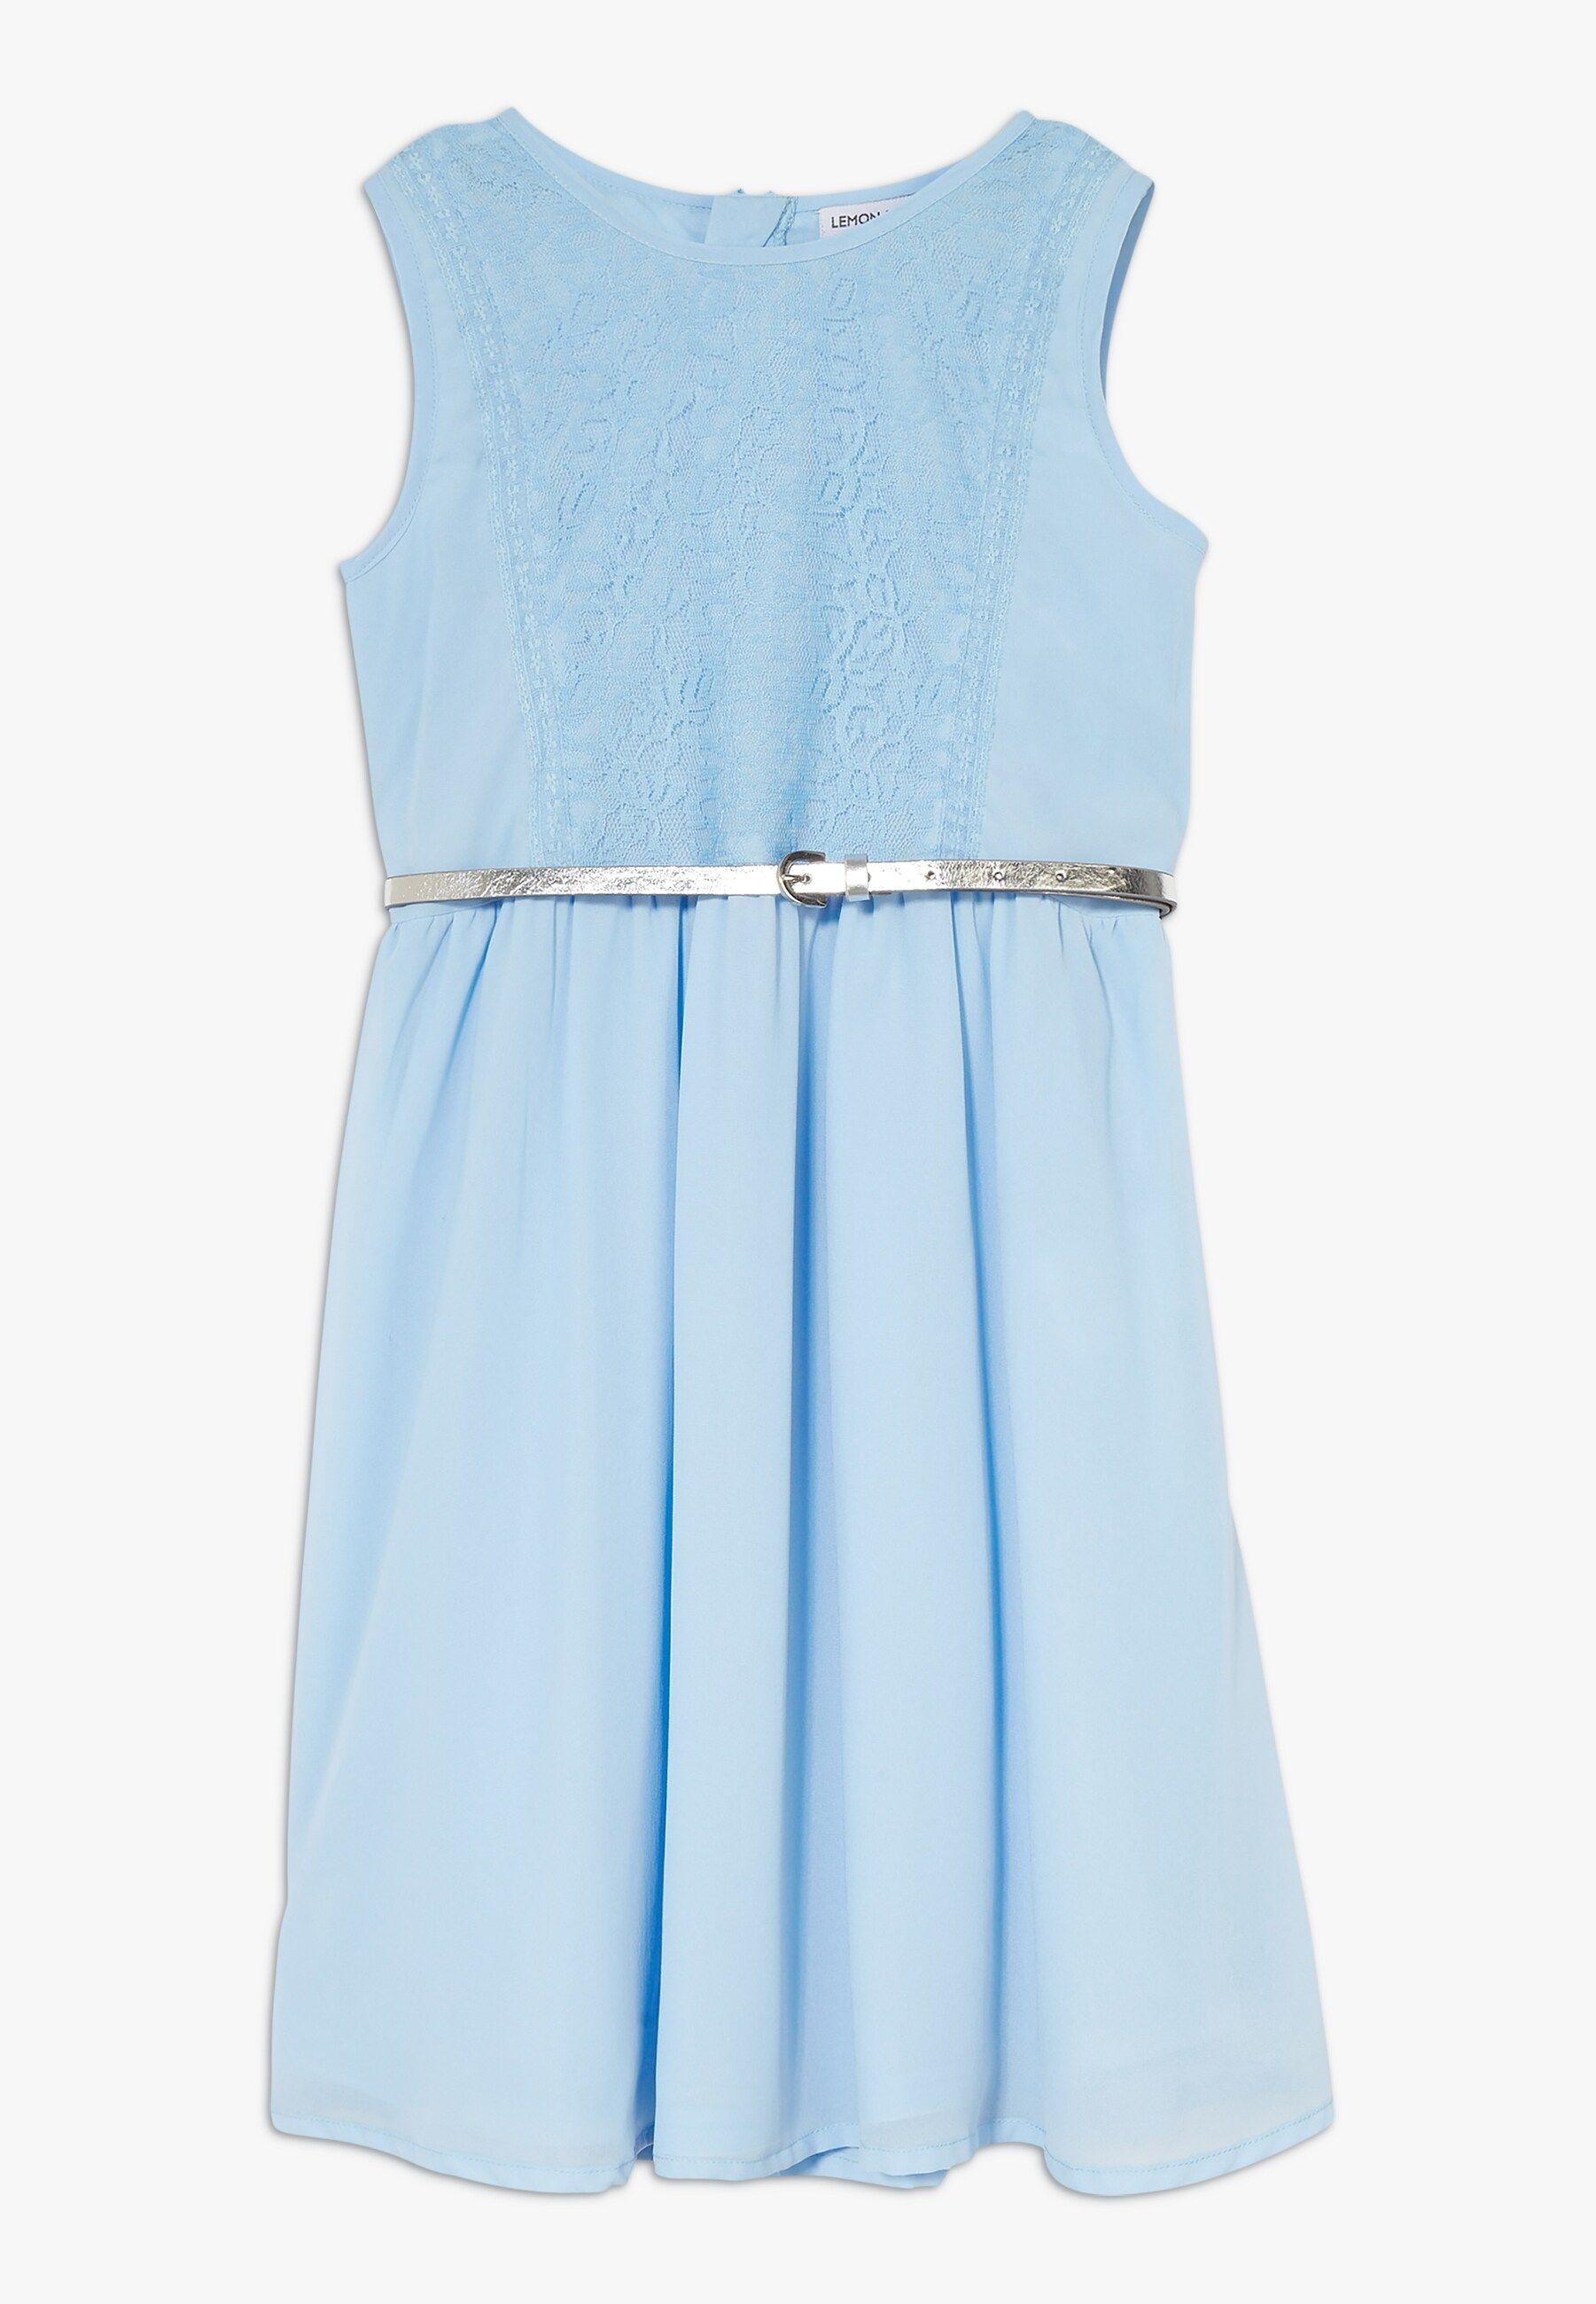 Festlich kleid hellblau Kleid, festlich